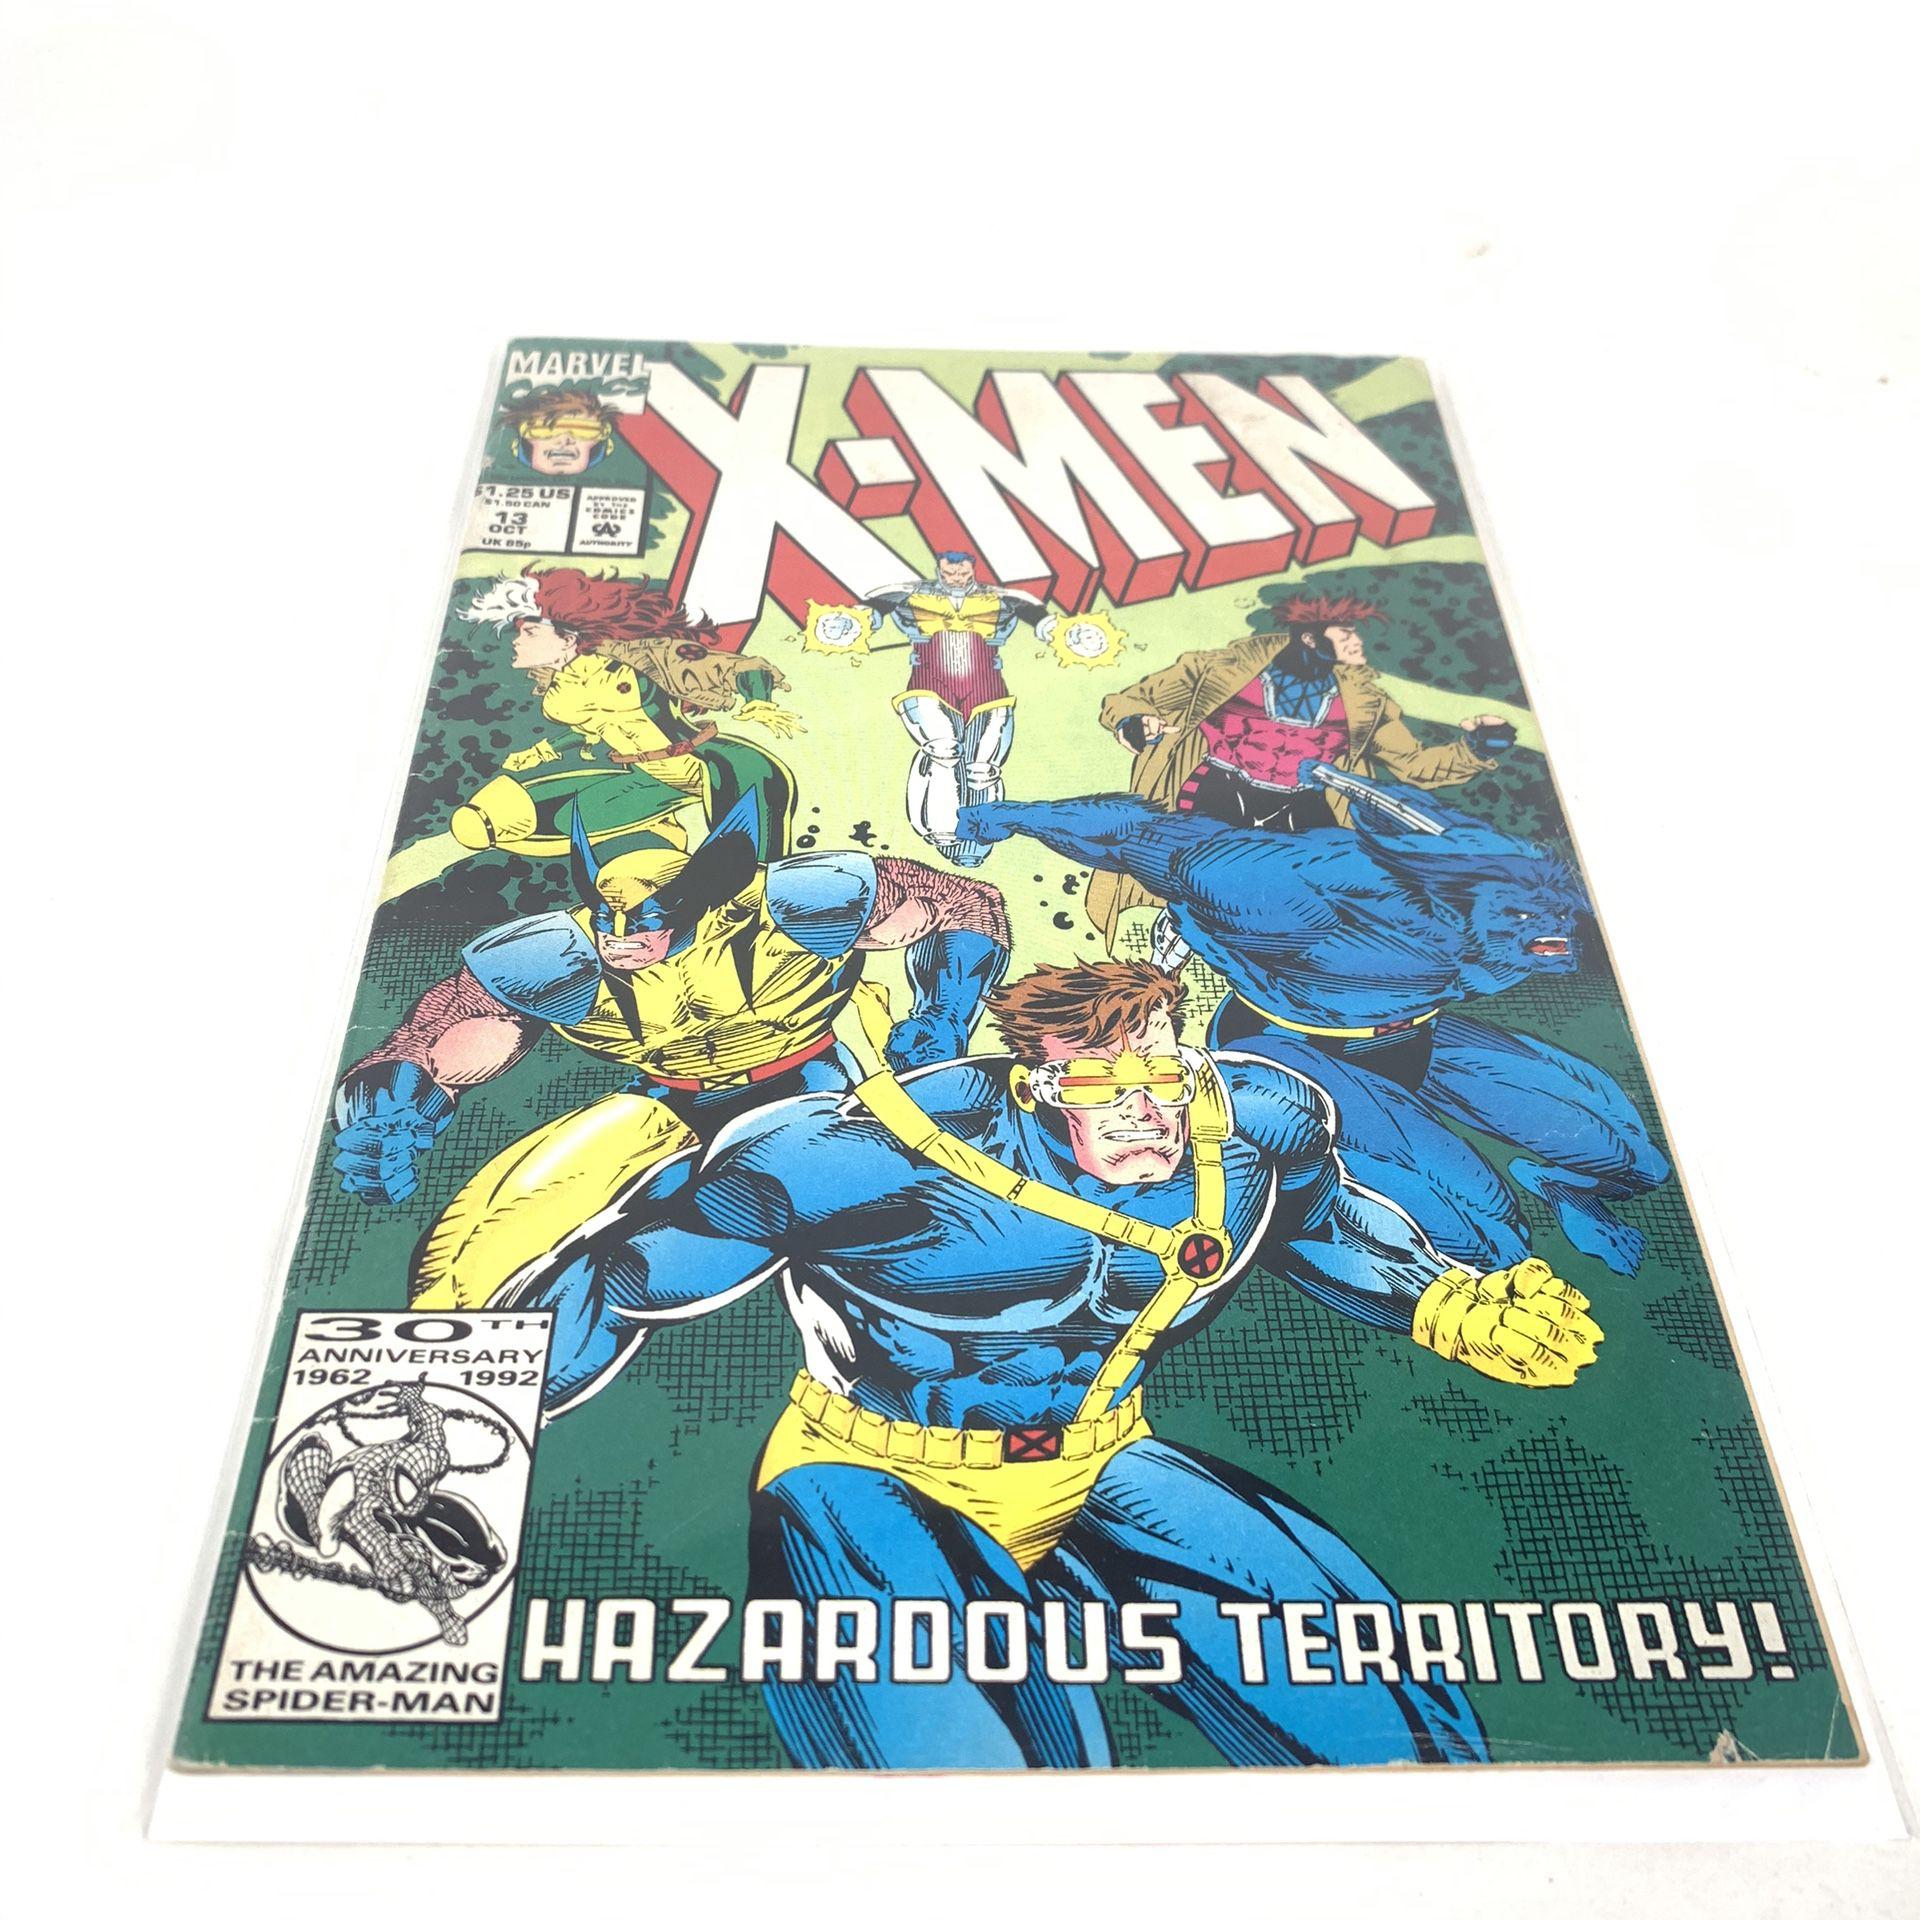 X-Men Issue # 13 October, 1992 Hazardous Territory Collectible Marvel Comics